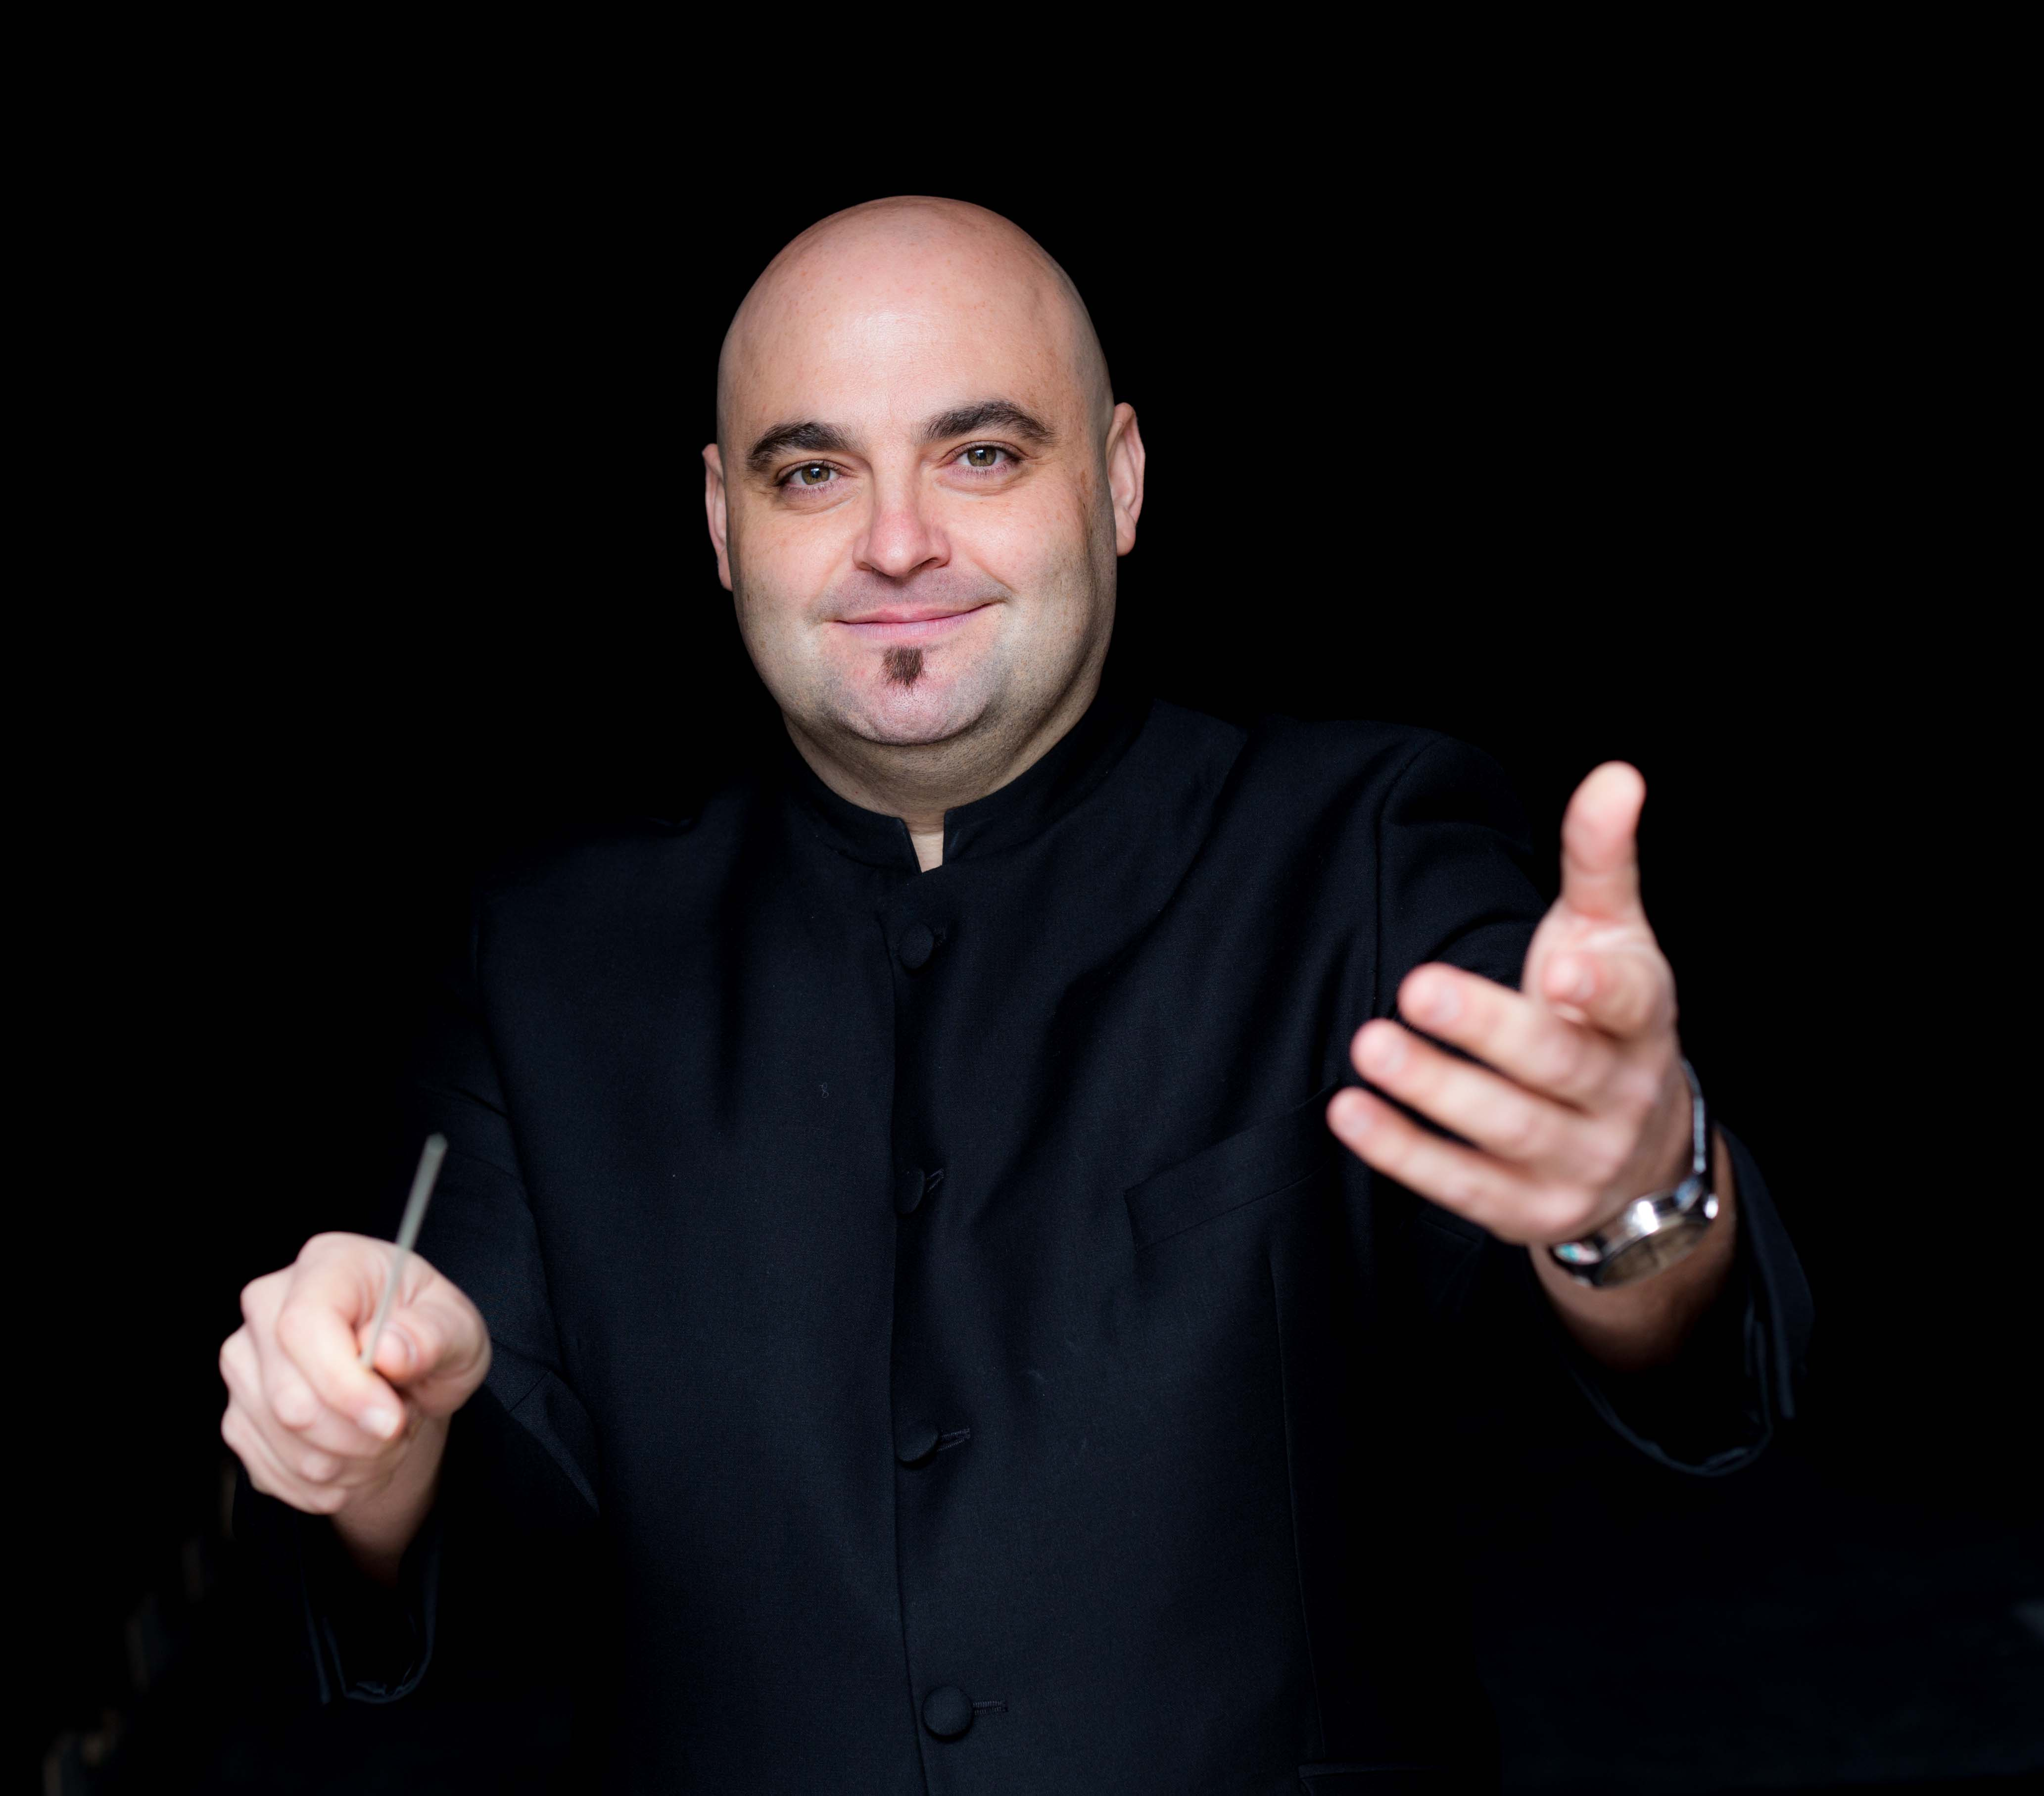 Raúl Miguel Rodríguez